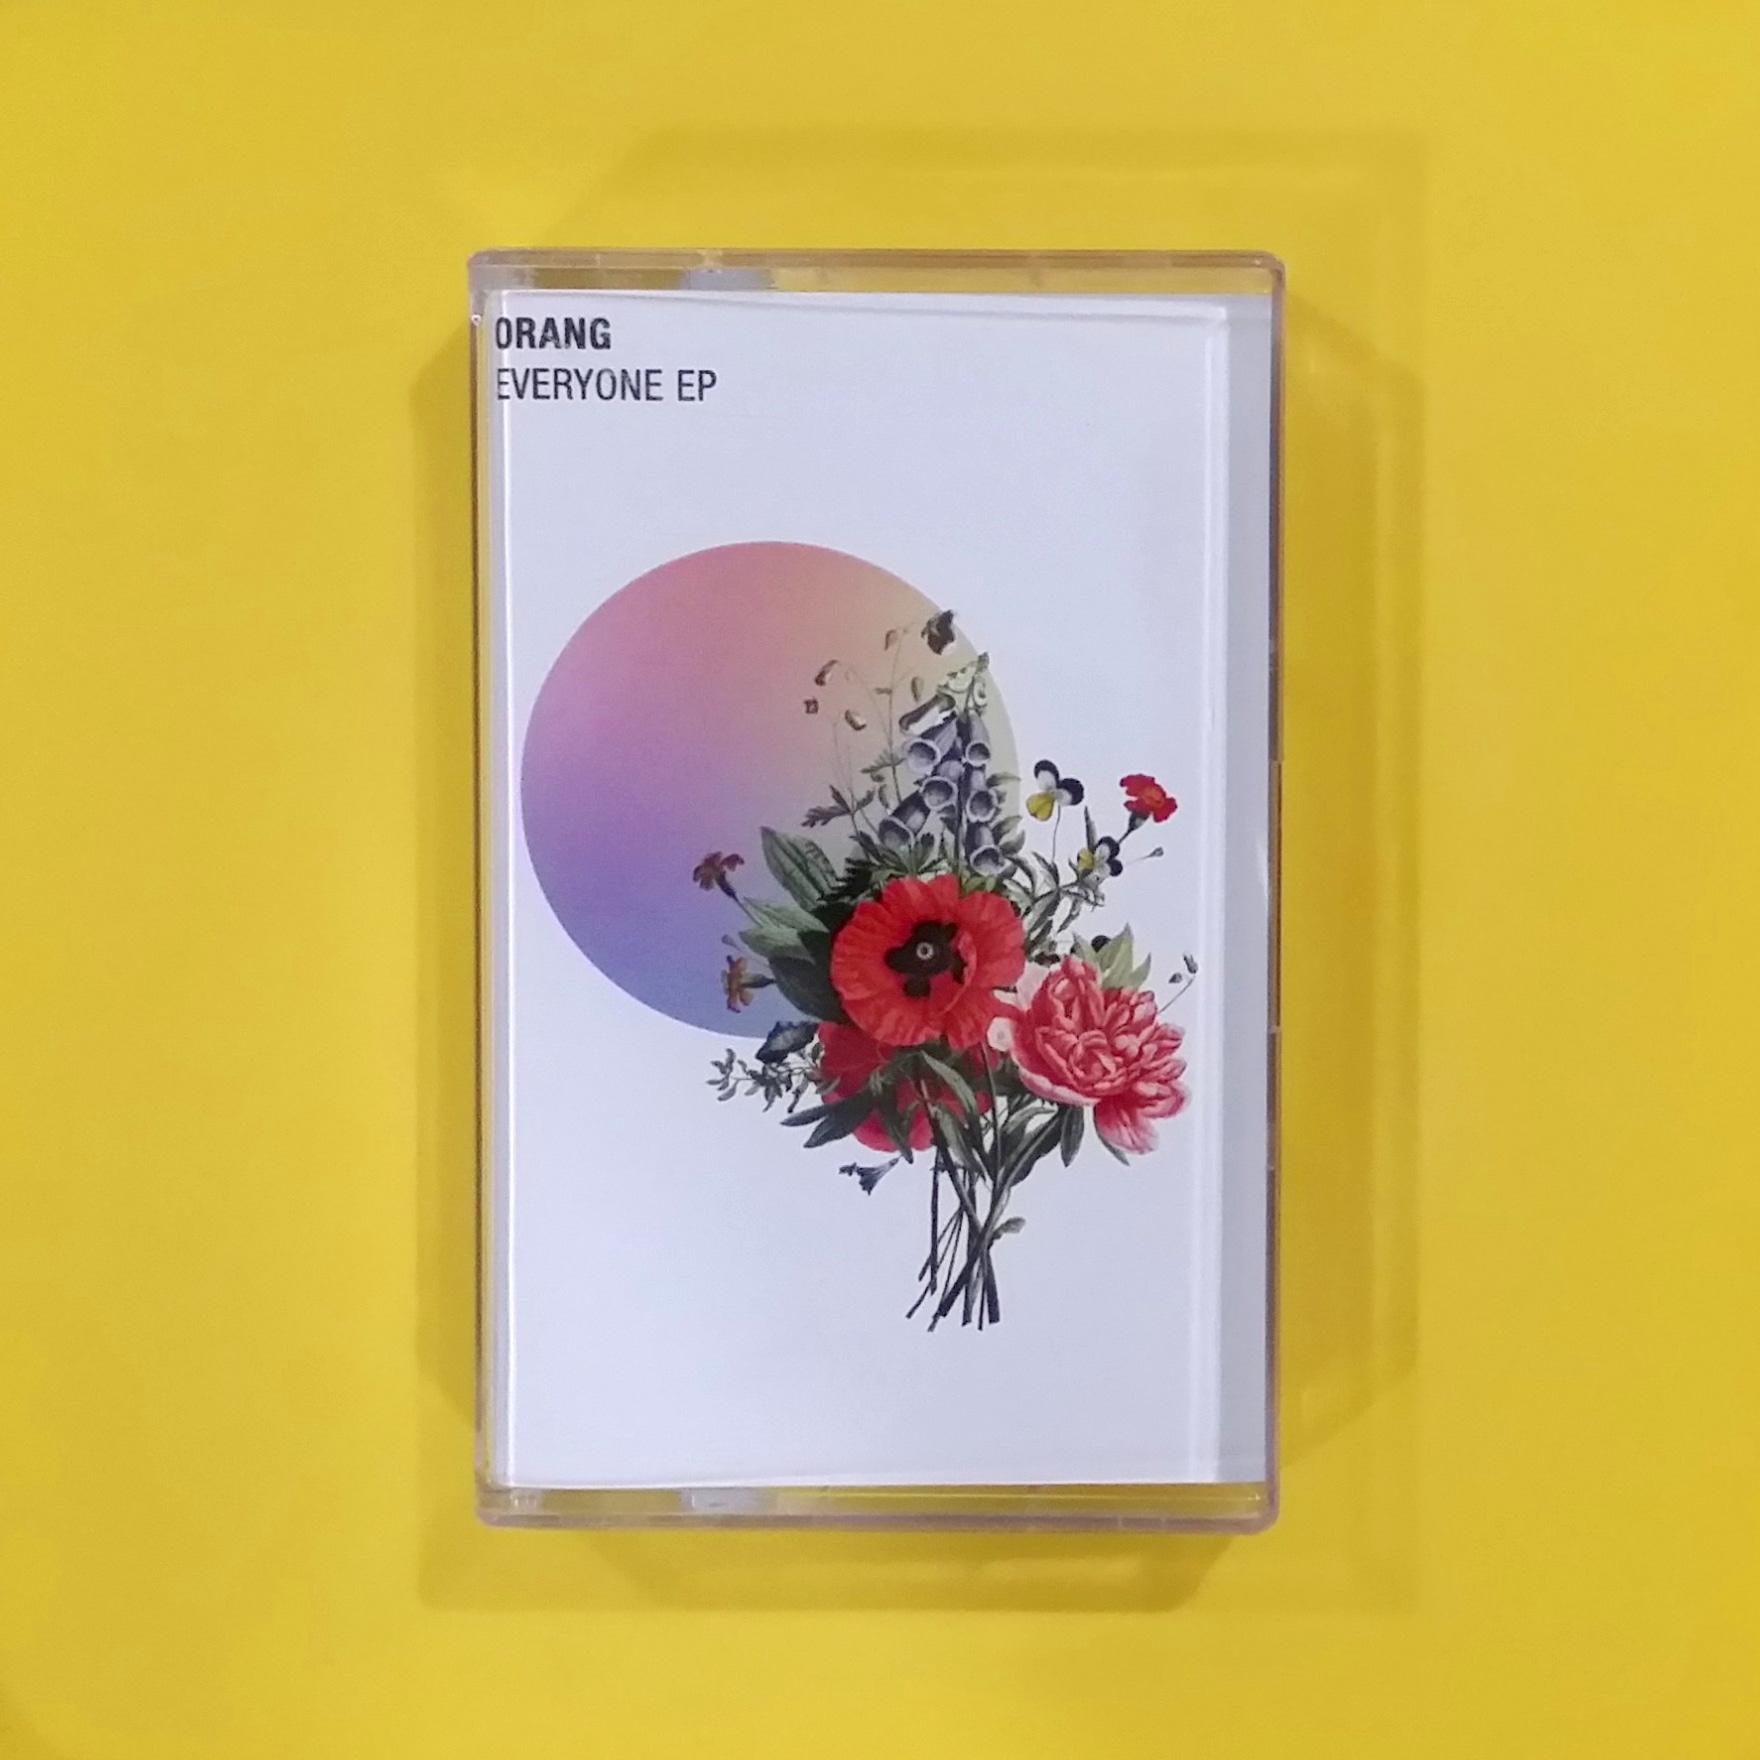 Orang - Everyone EP (Botanic Records)